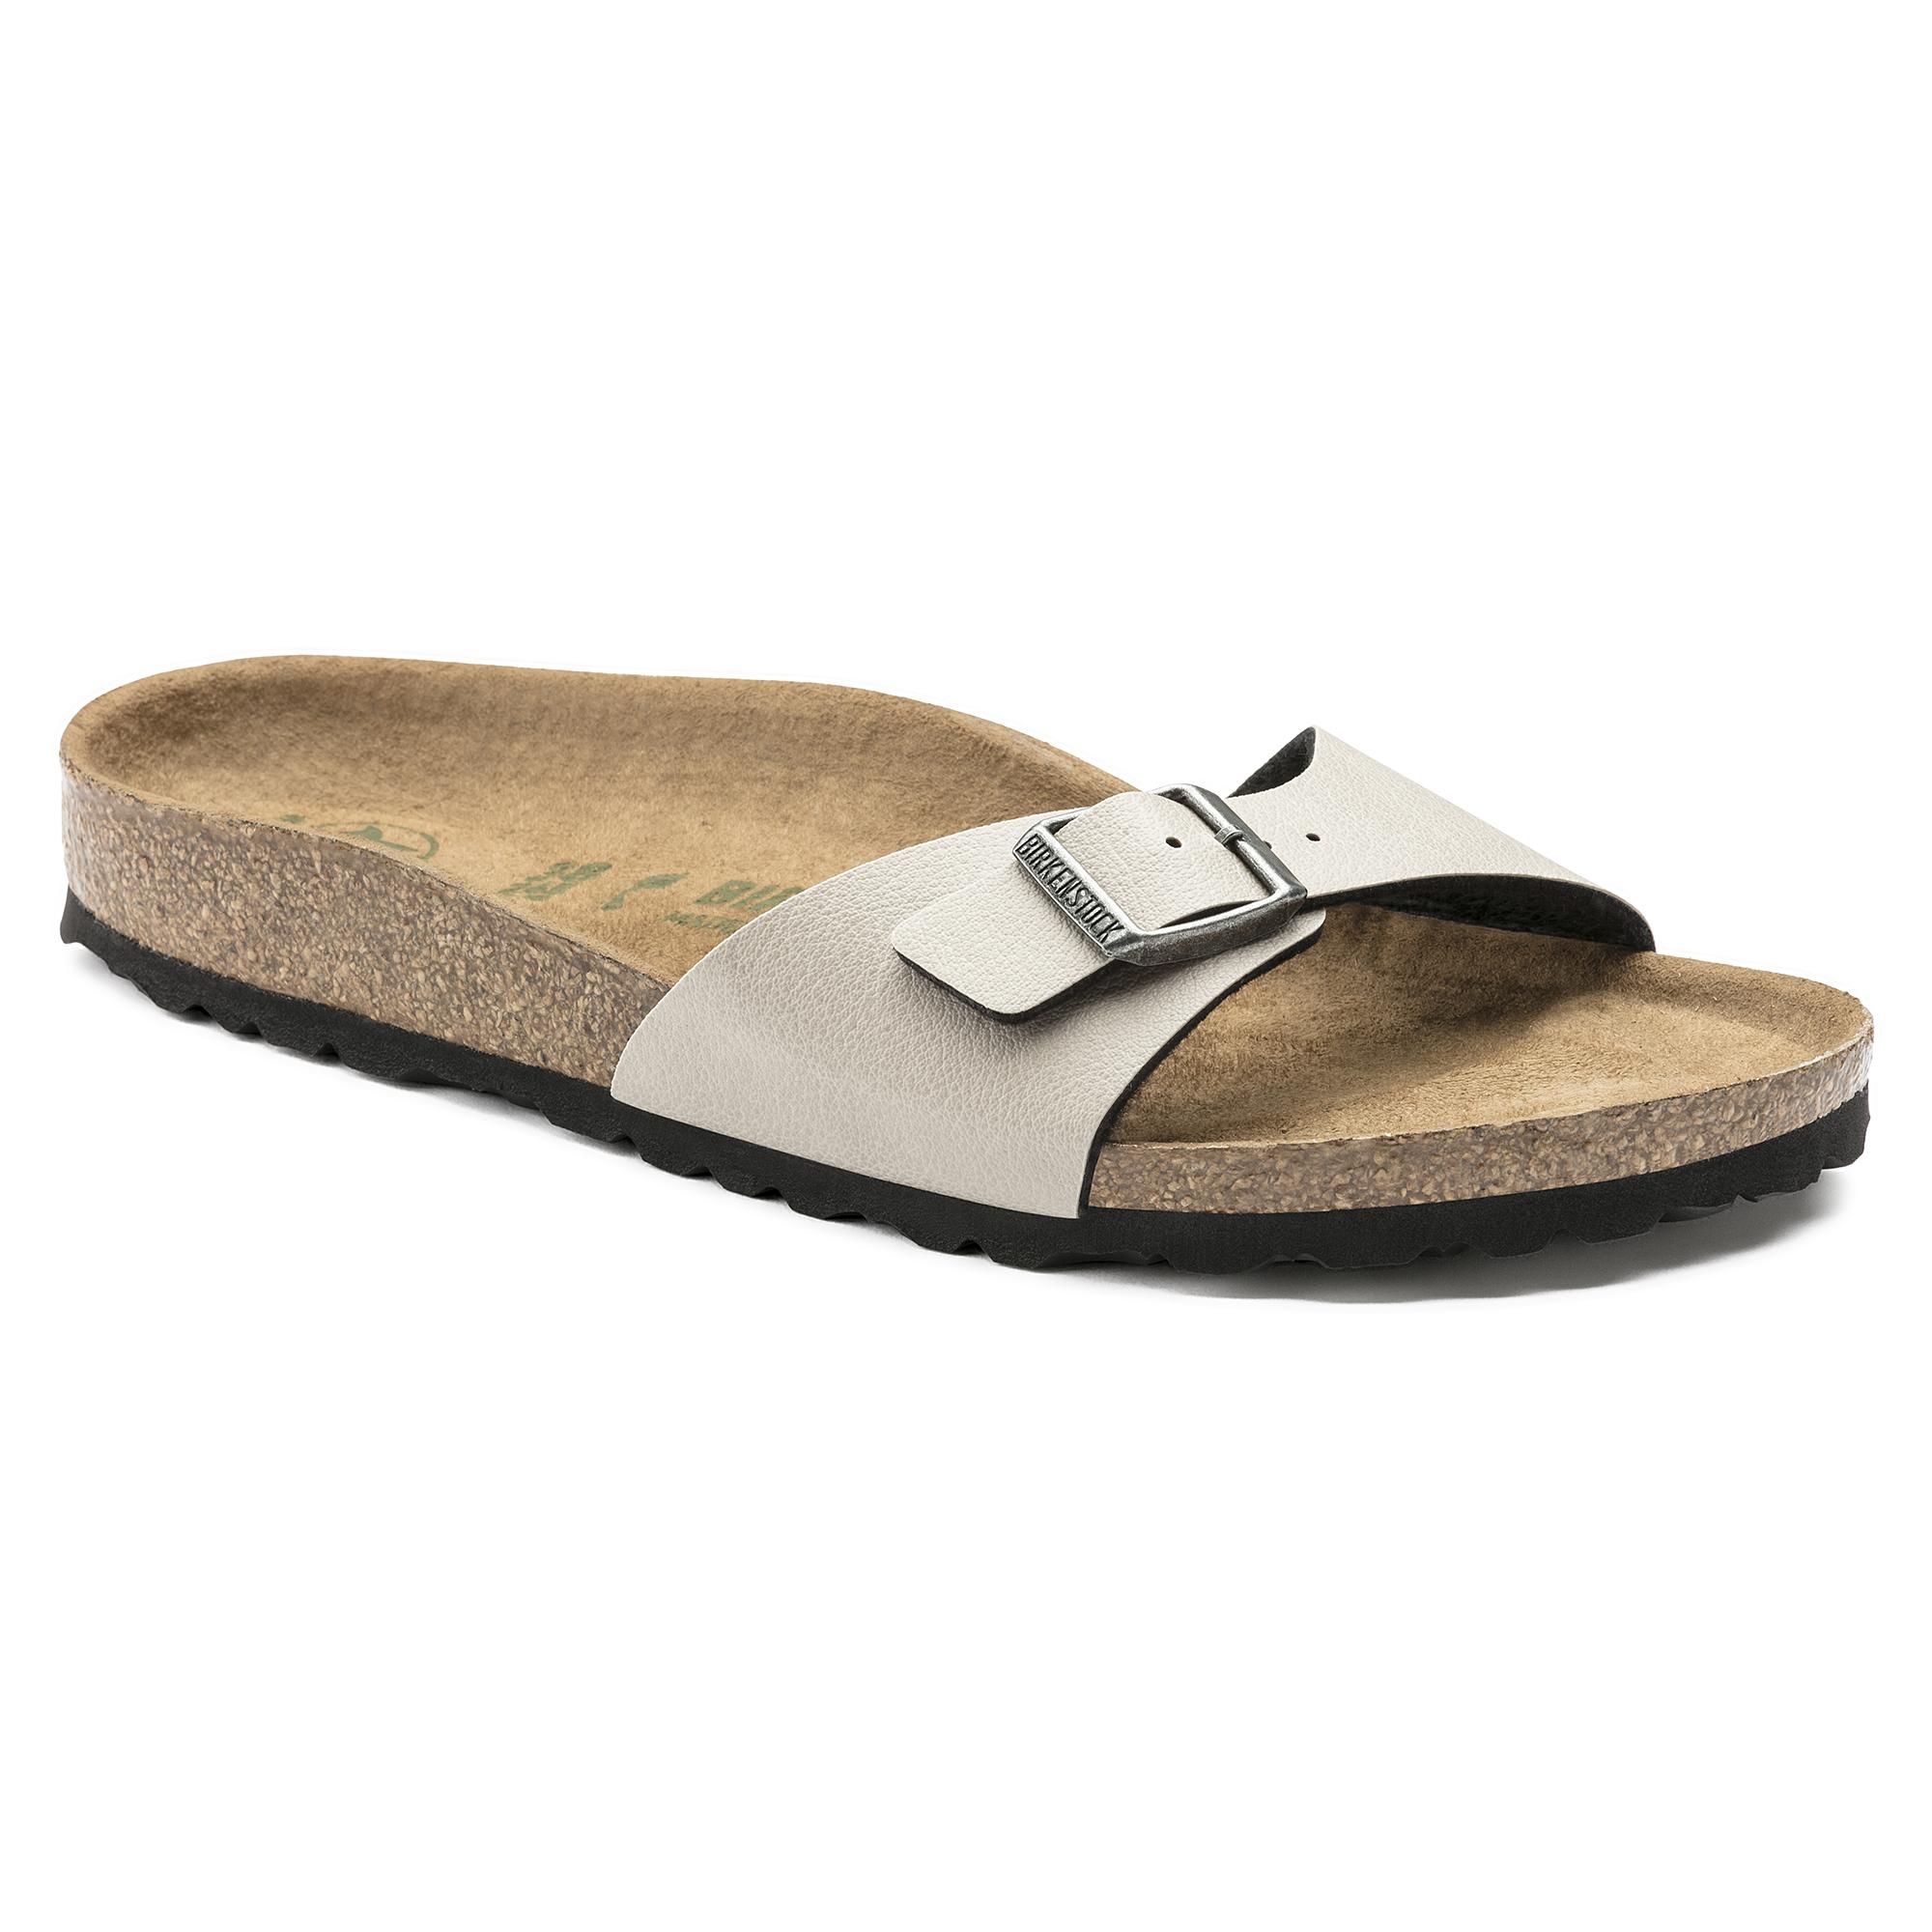 Birkenstock Madrid Birko flor Sandals Pull up Stone Slip on